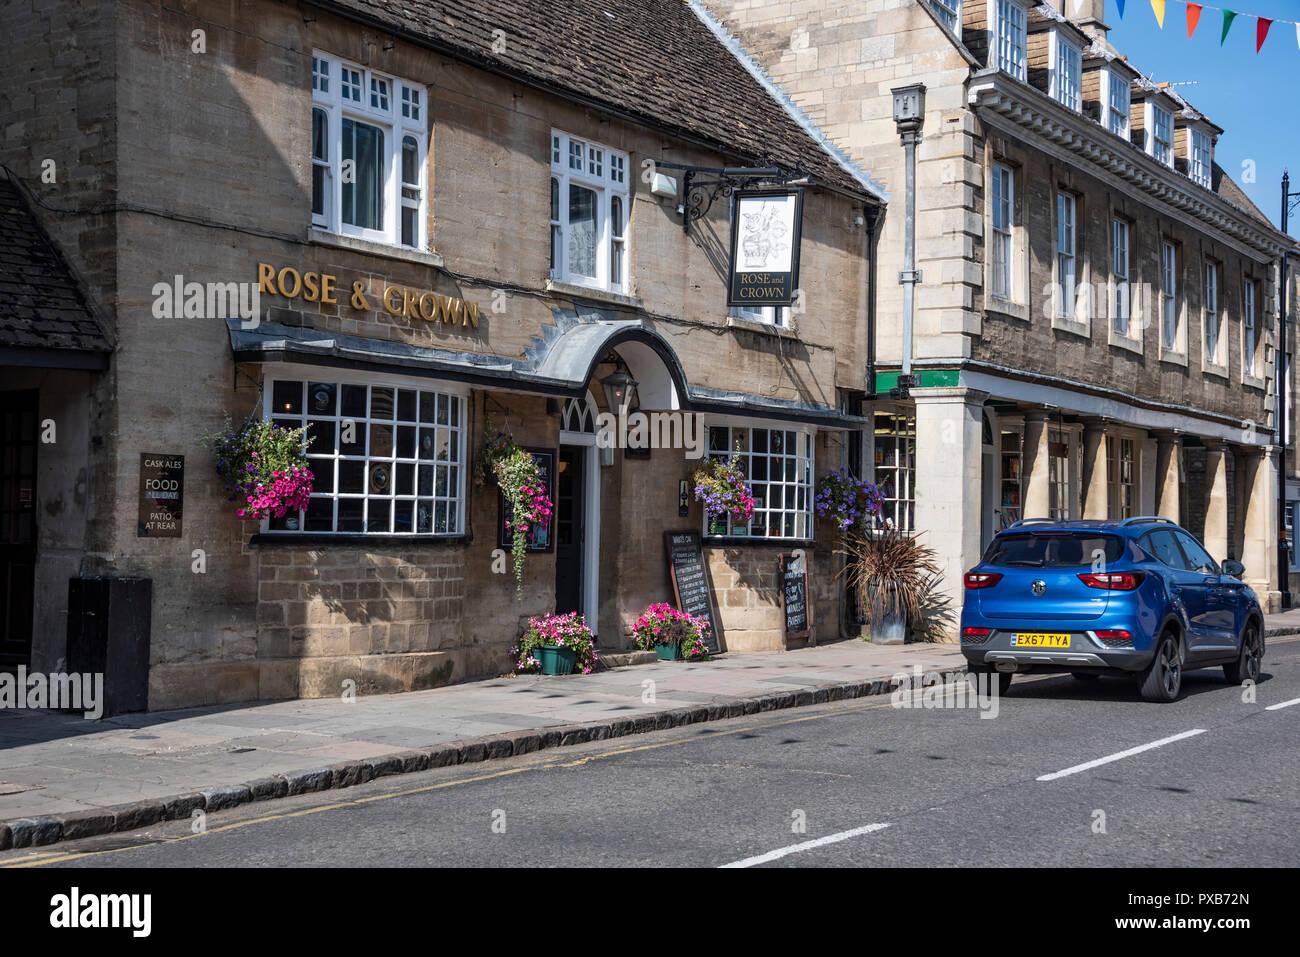 Oundle, Northamptonshire, England - Stock Image